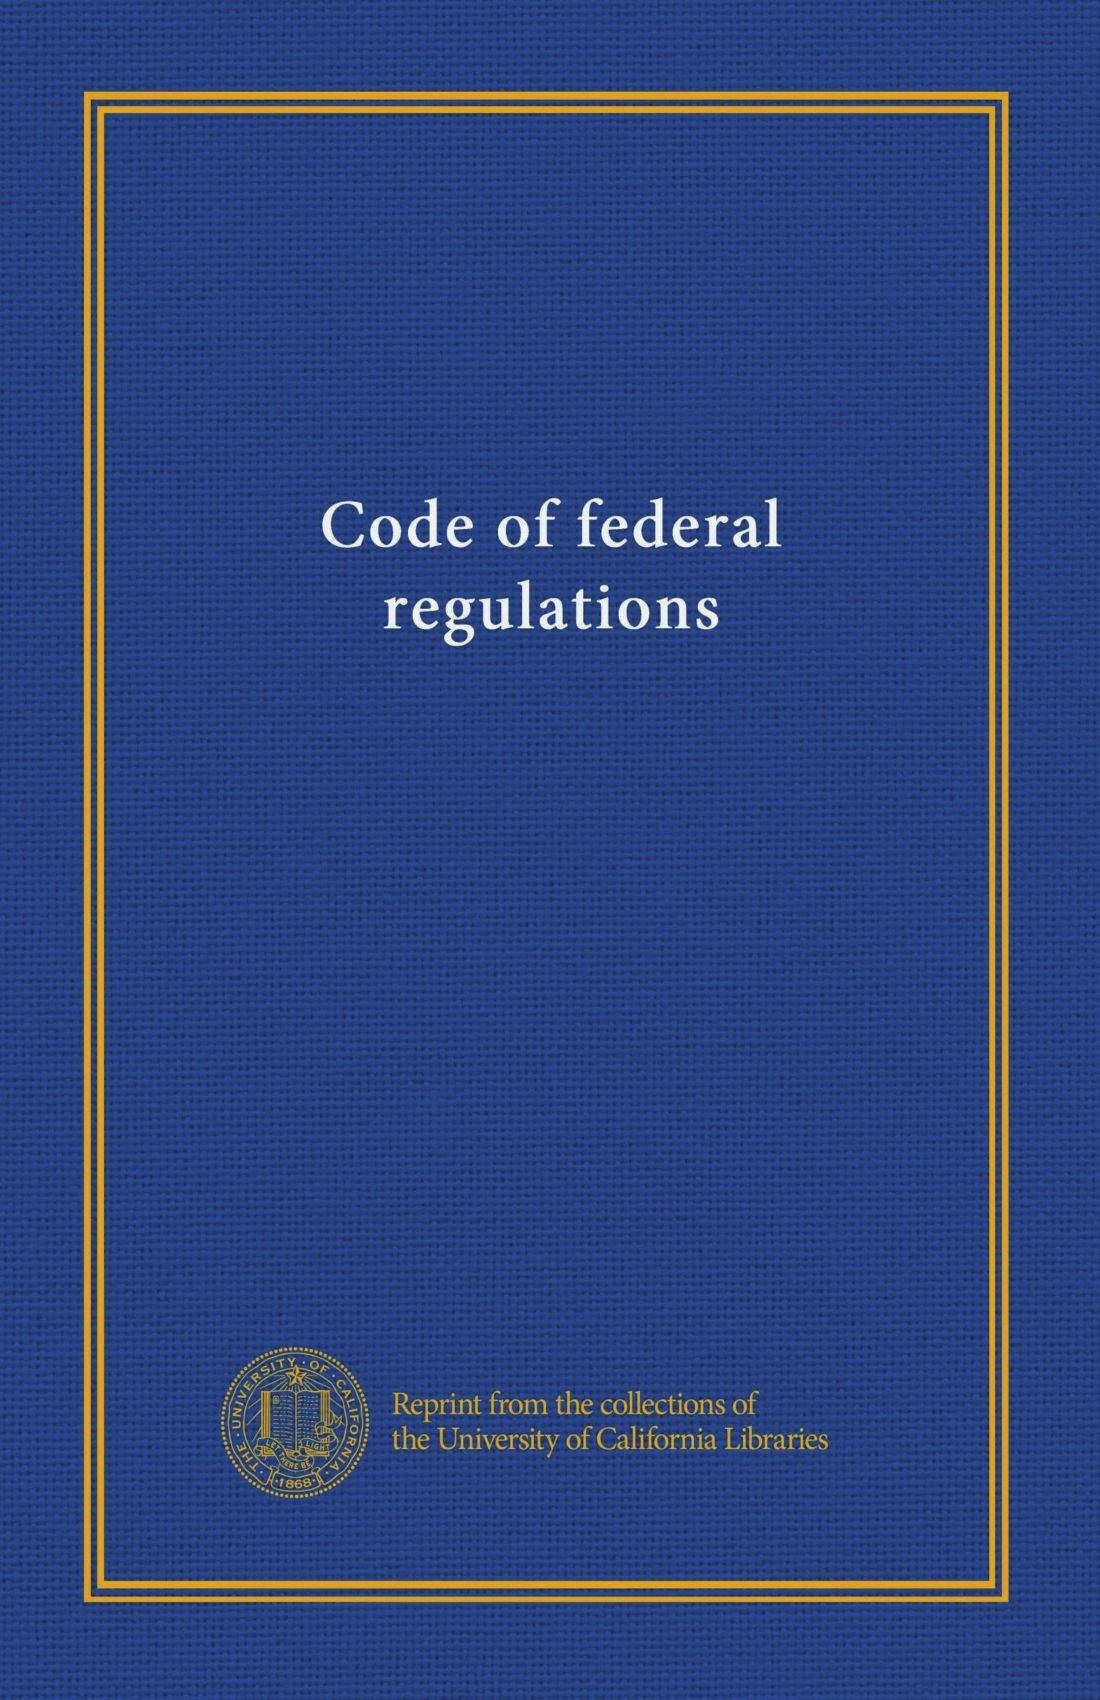 Download Code of federal regulations ((Title) 47:80-end 1969) ebook